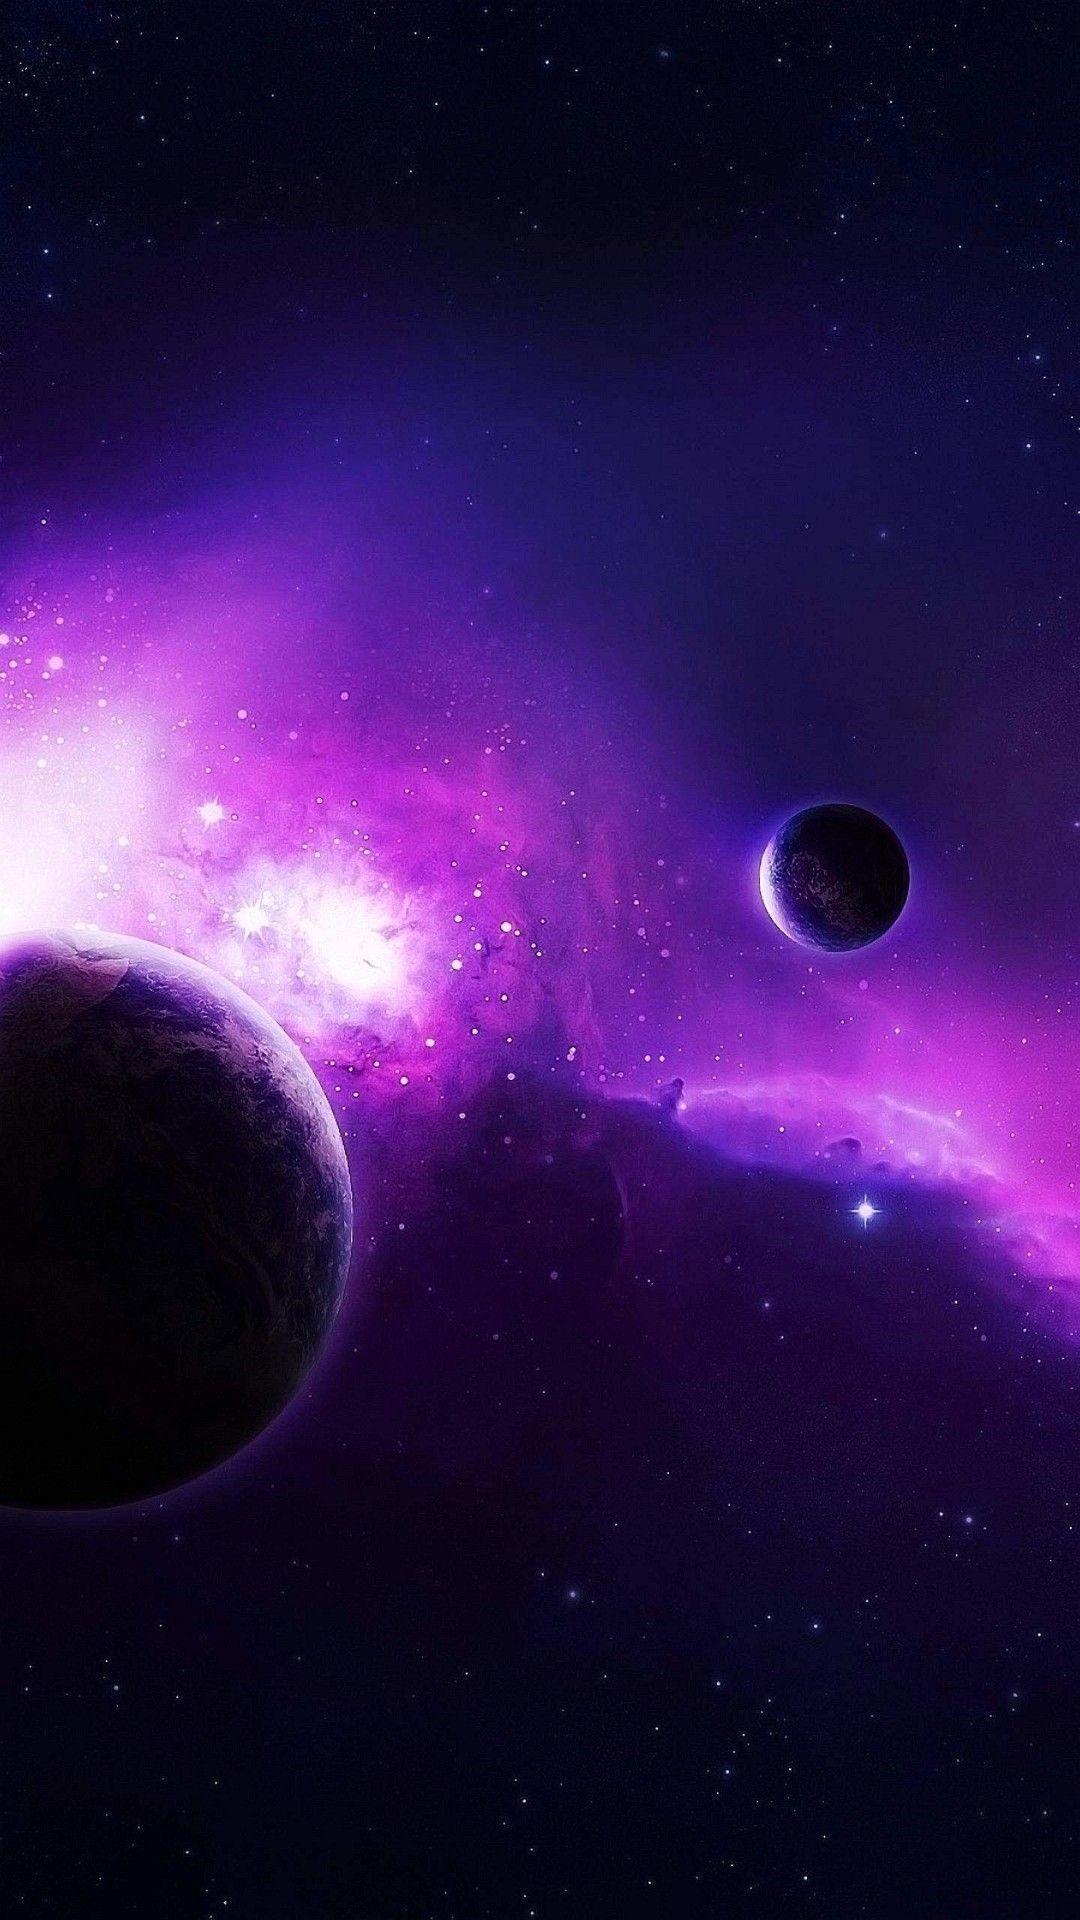 Astros e planetas